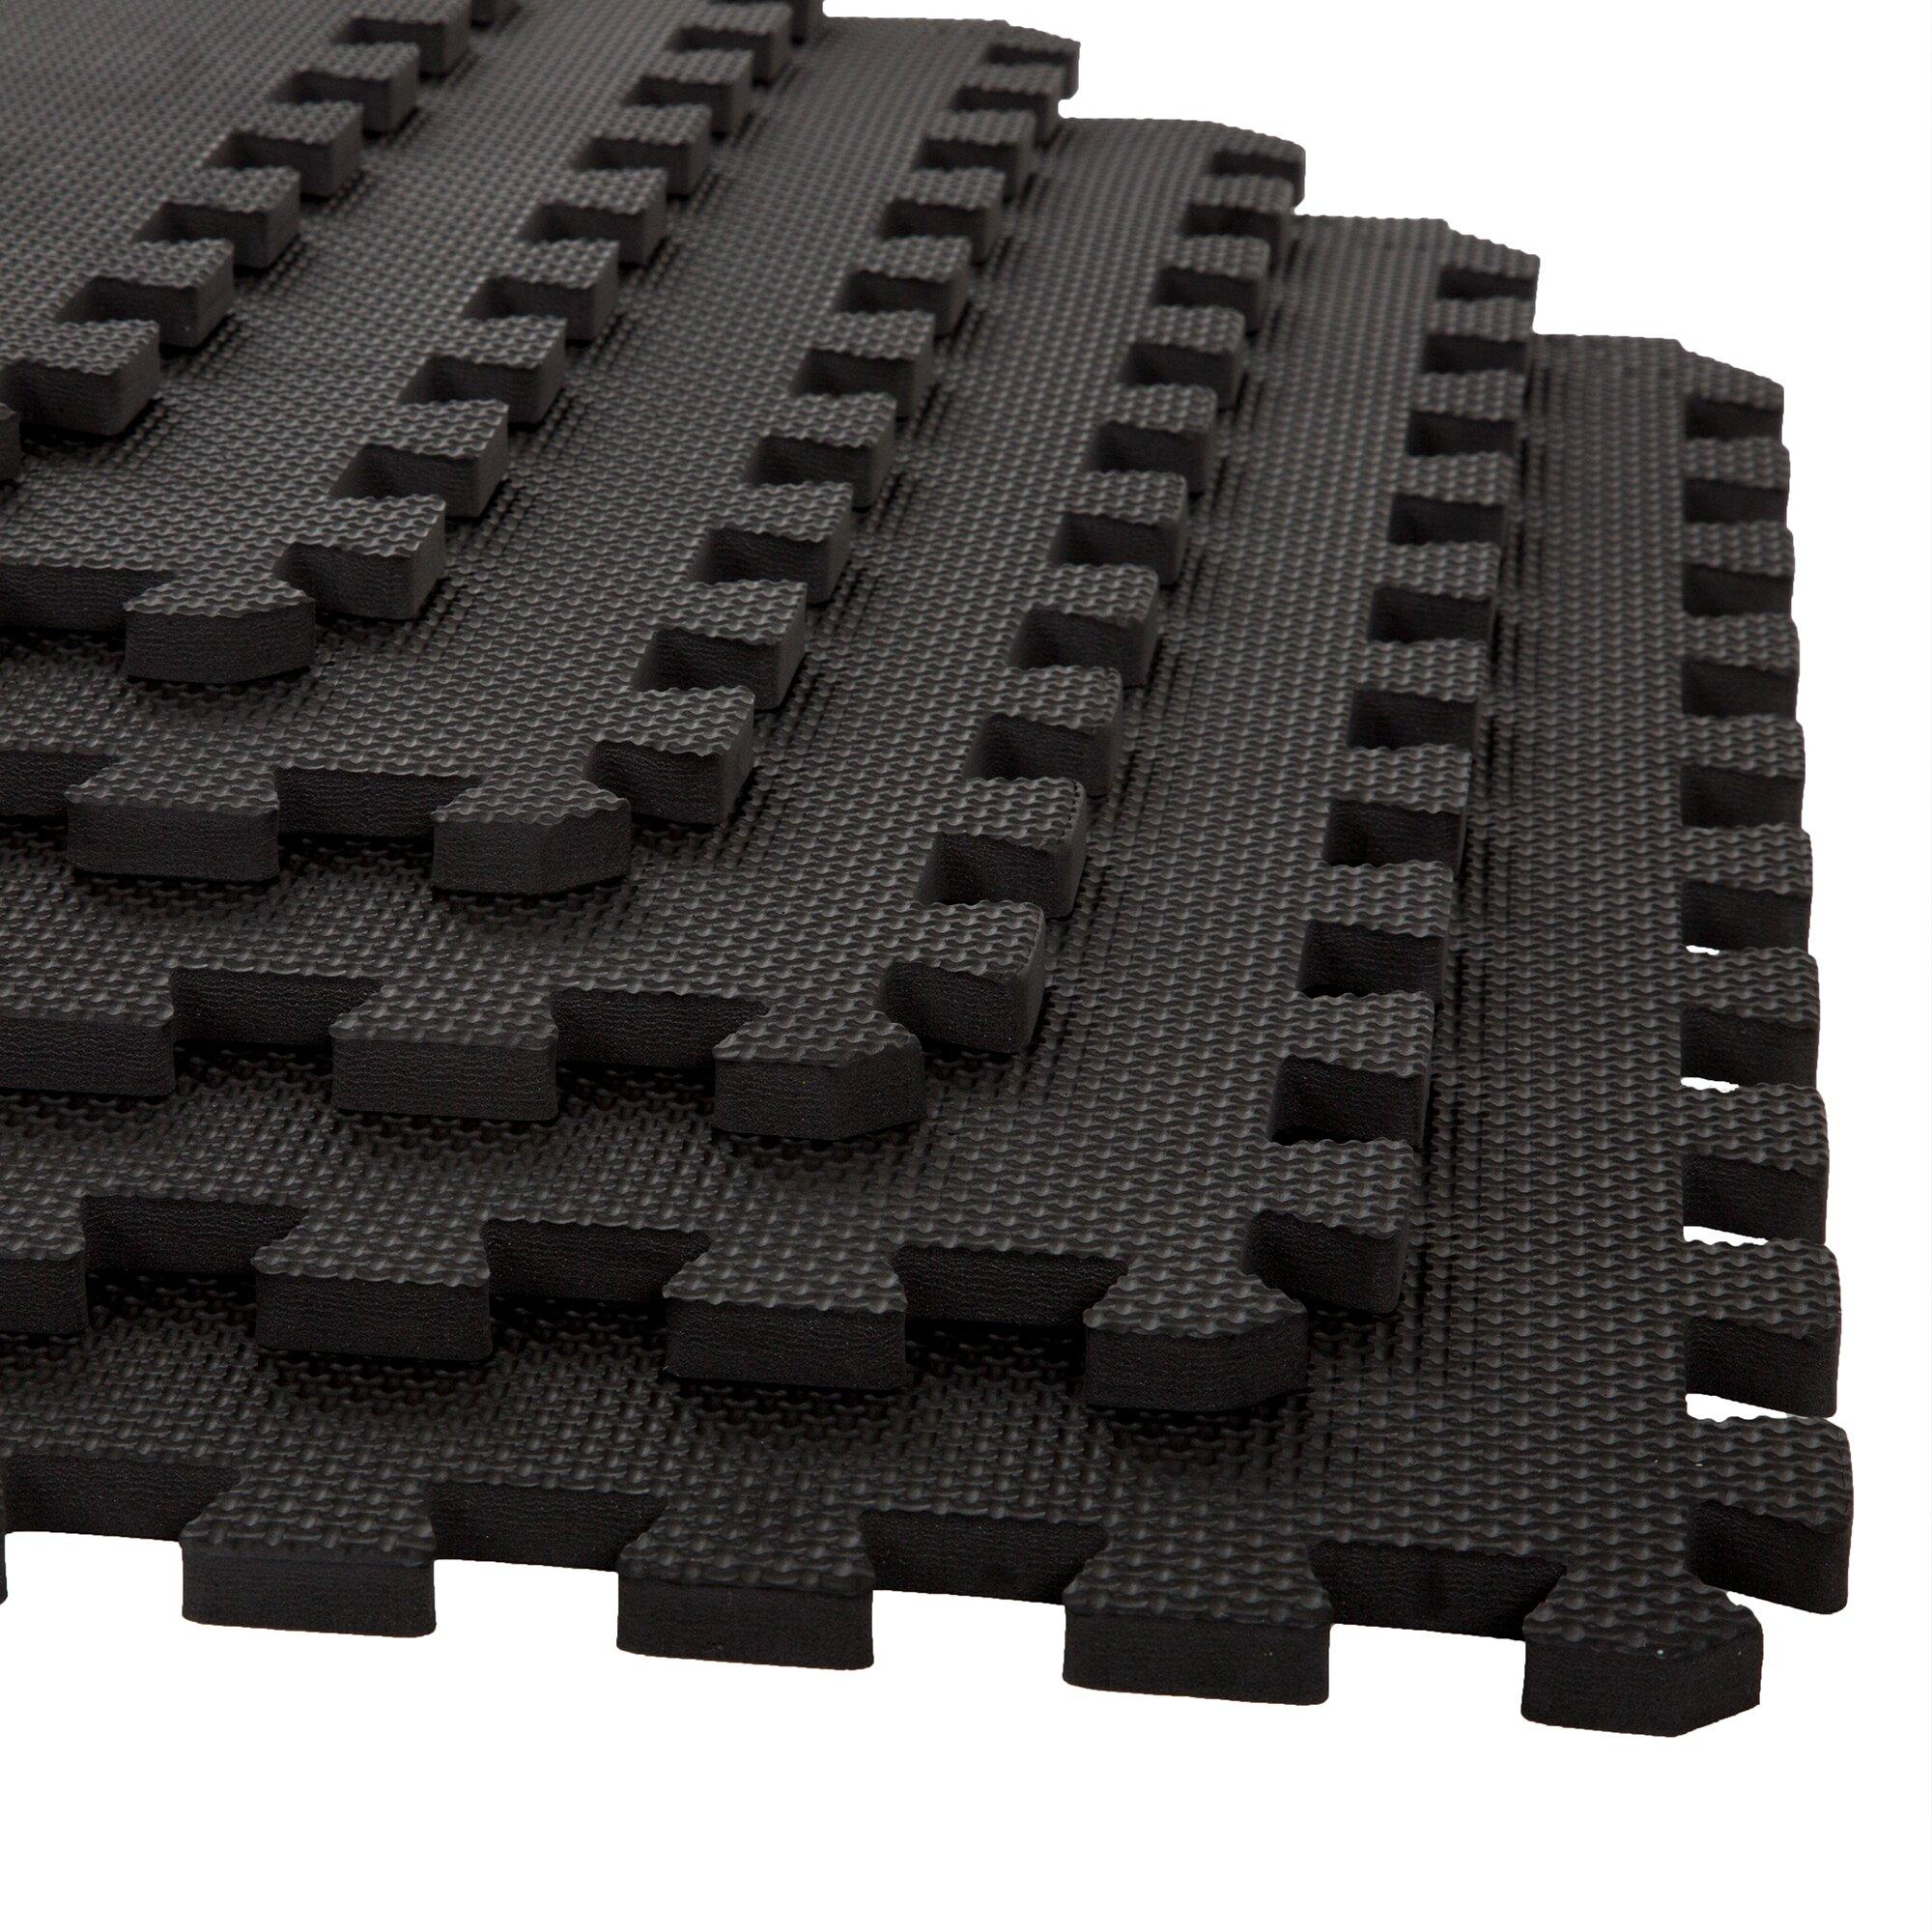 Stalwart Black Eva Foam Floor Mats Set Of 6 Amp Reviews